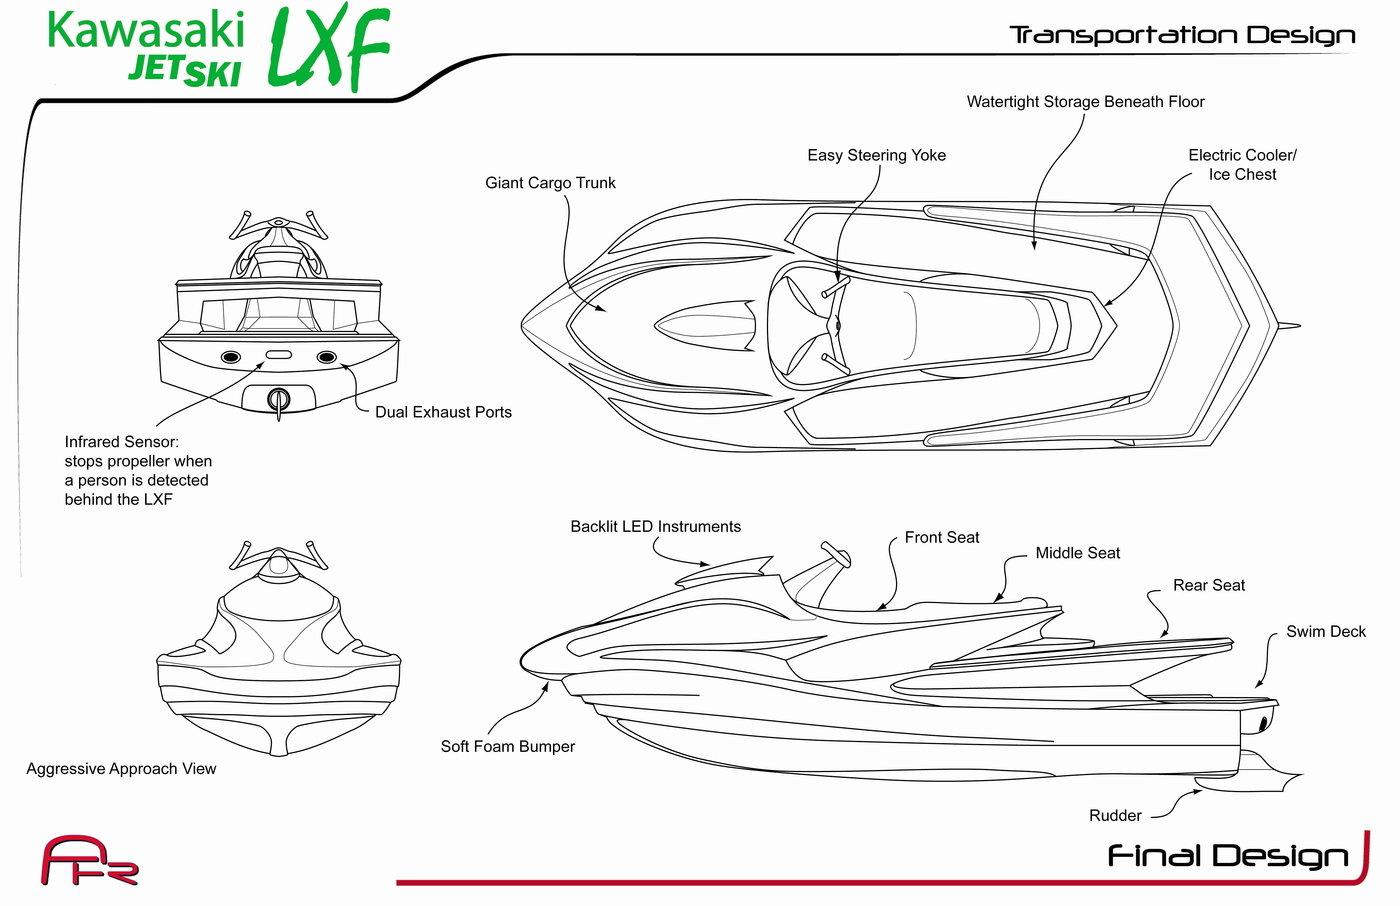 hight resolution of jet ski diagram wiring diagram writejet ski boat diagram wiring diagram write 1998 yamaha jet ski